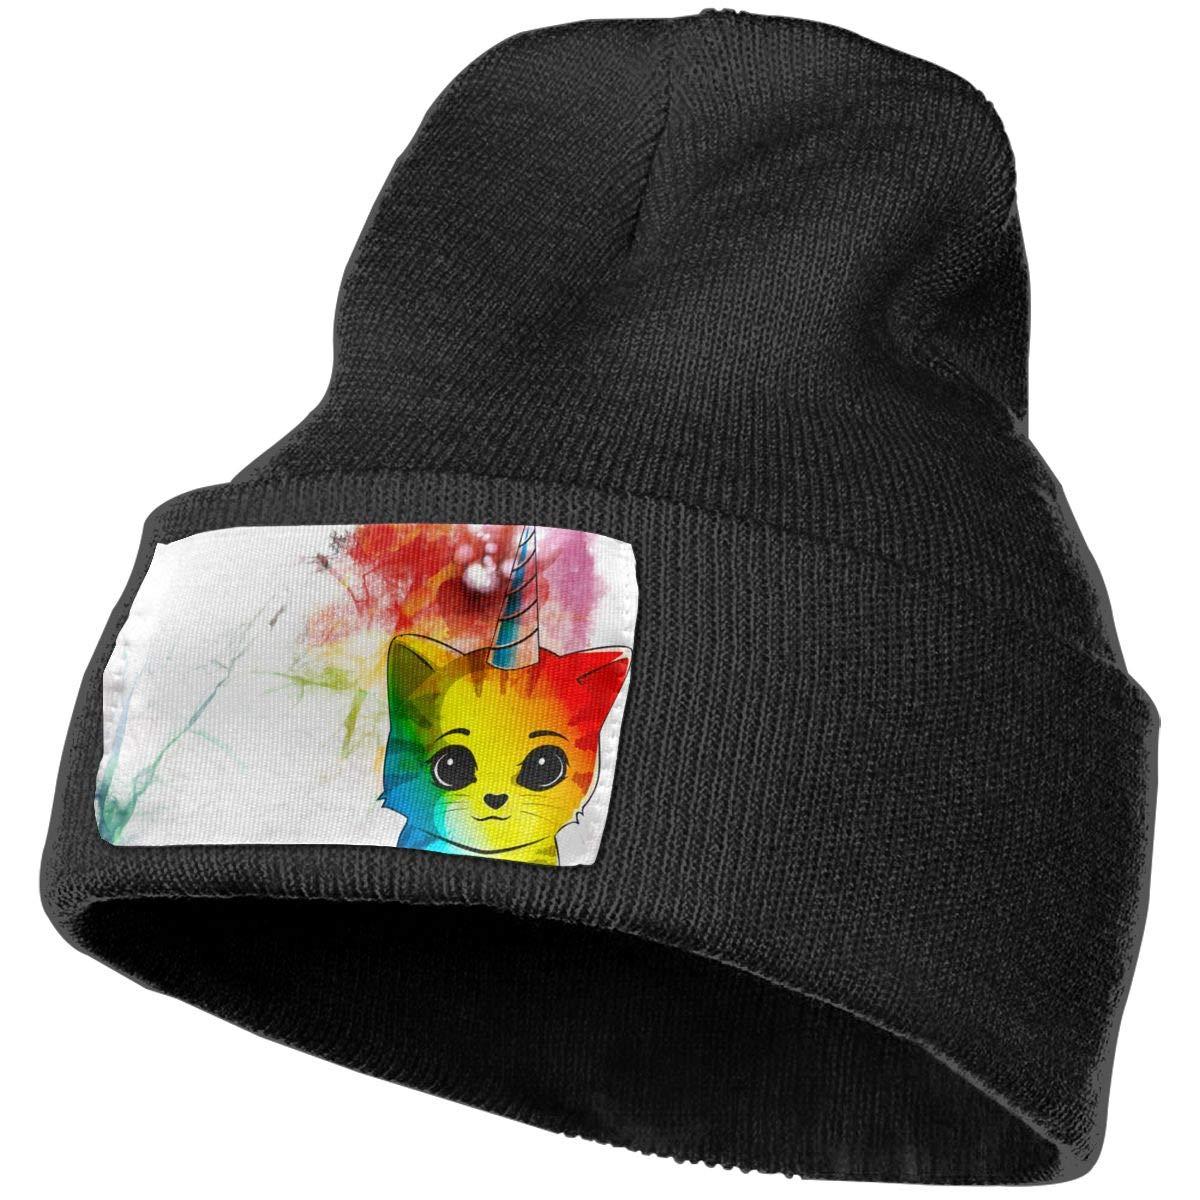 Horizon-t Cats and Flowers Unisex 100/% Acrylic Knitting Hat Cap Fashion Beanie Hat